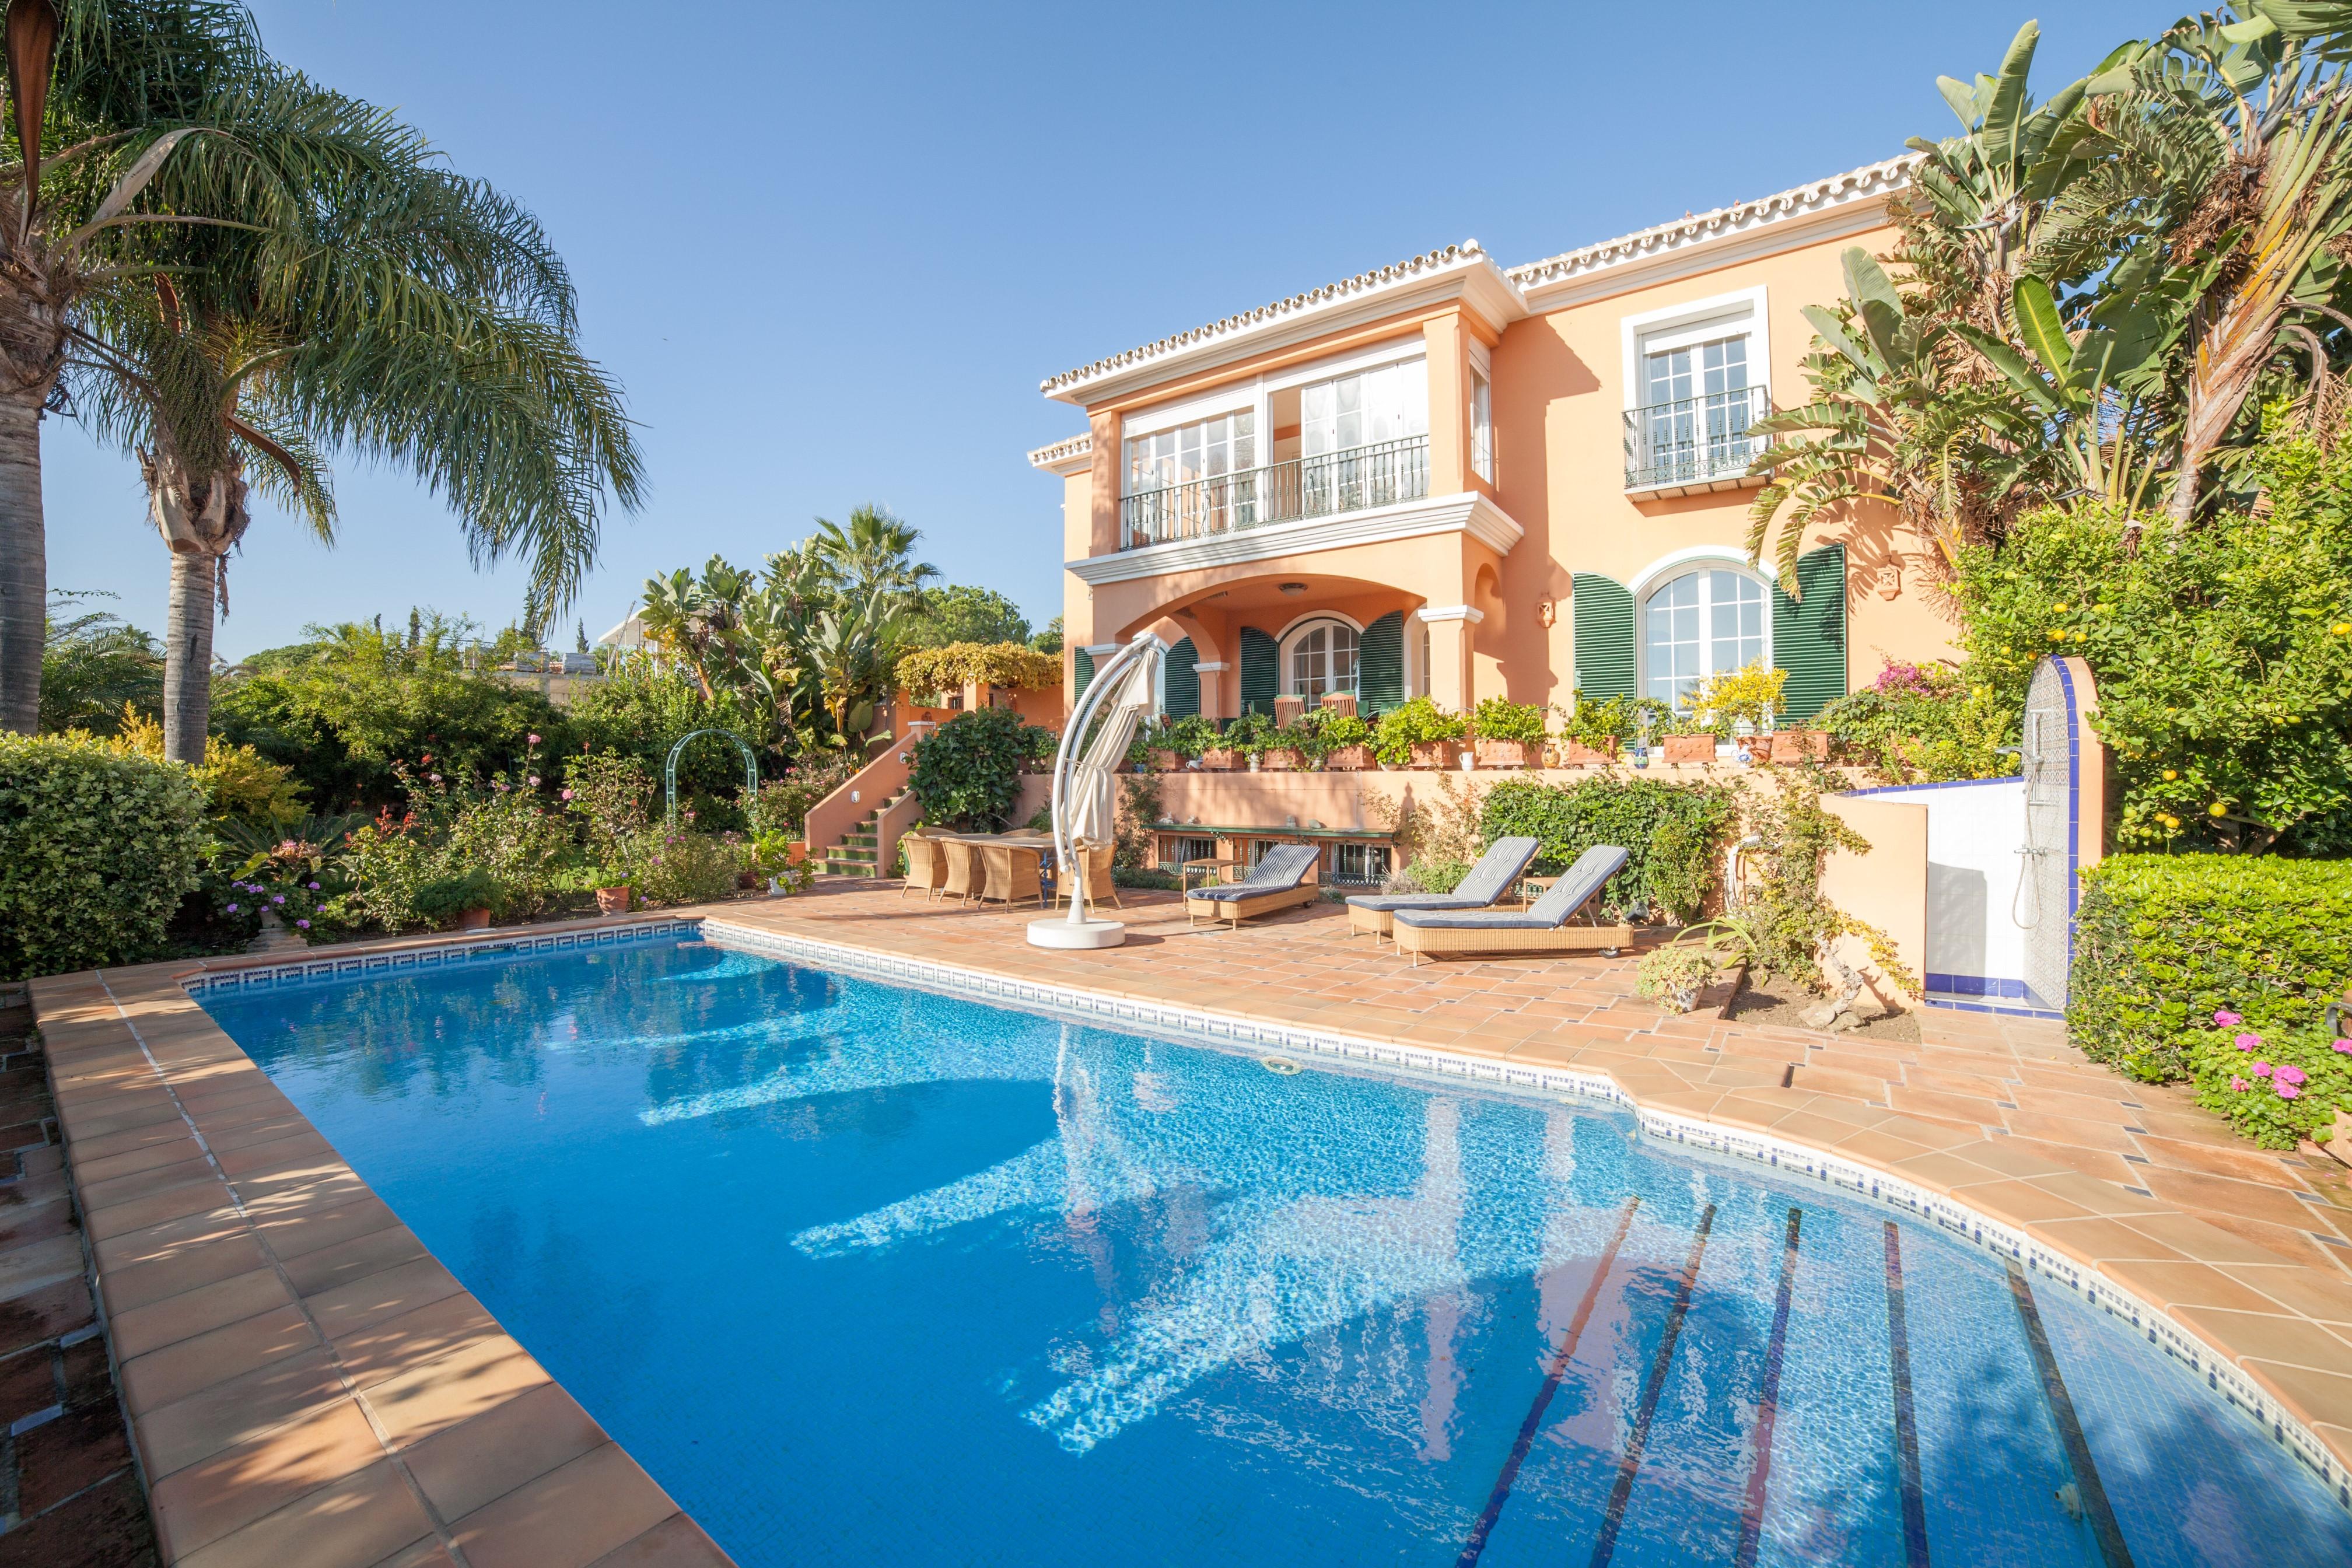 Luxury Mediterranean beachside villa in Carib Playa